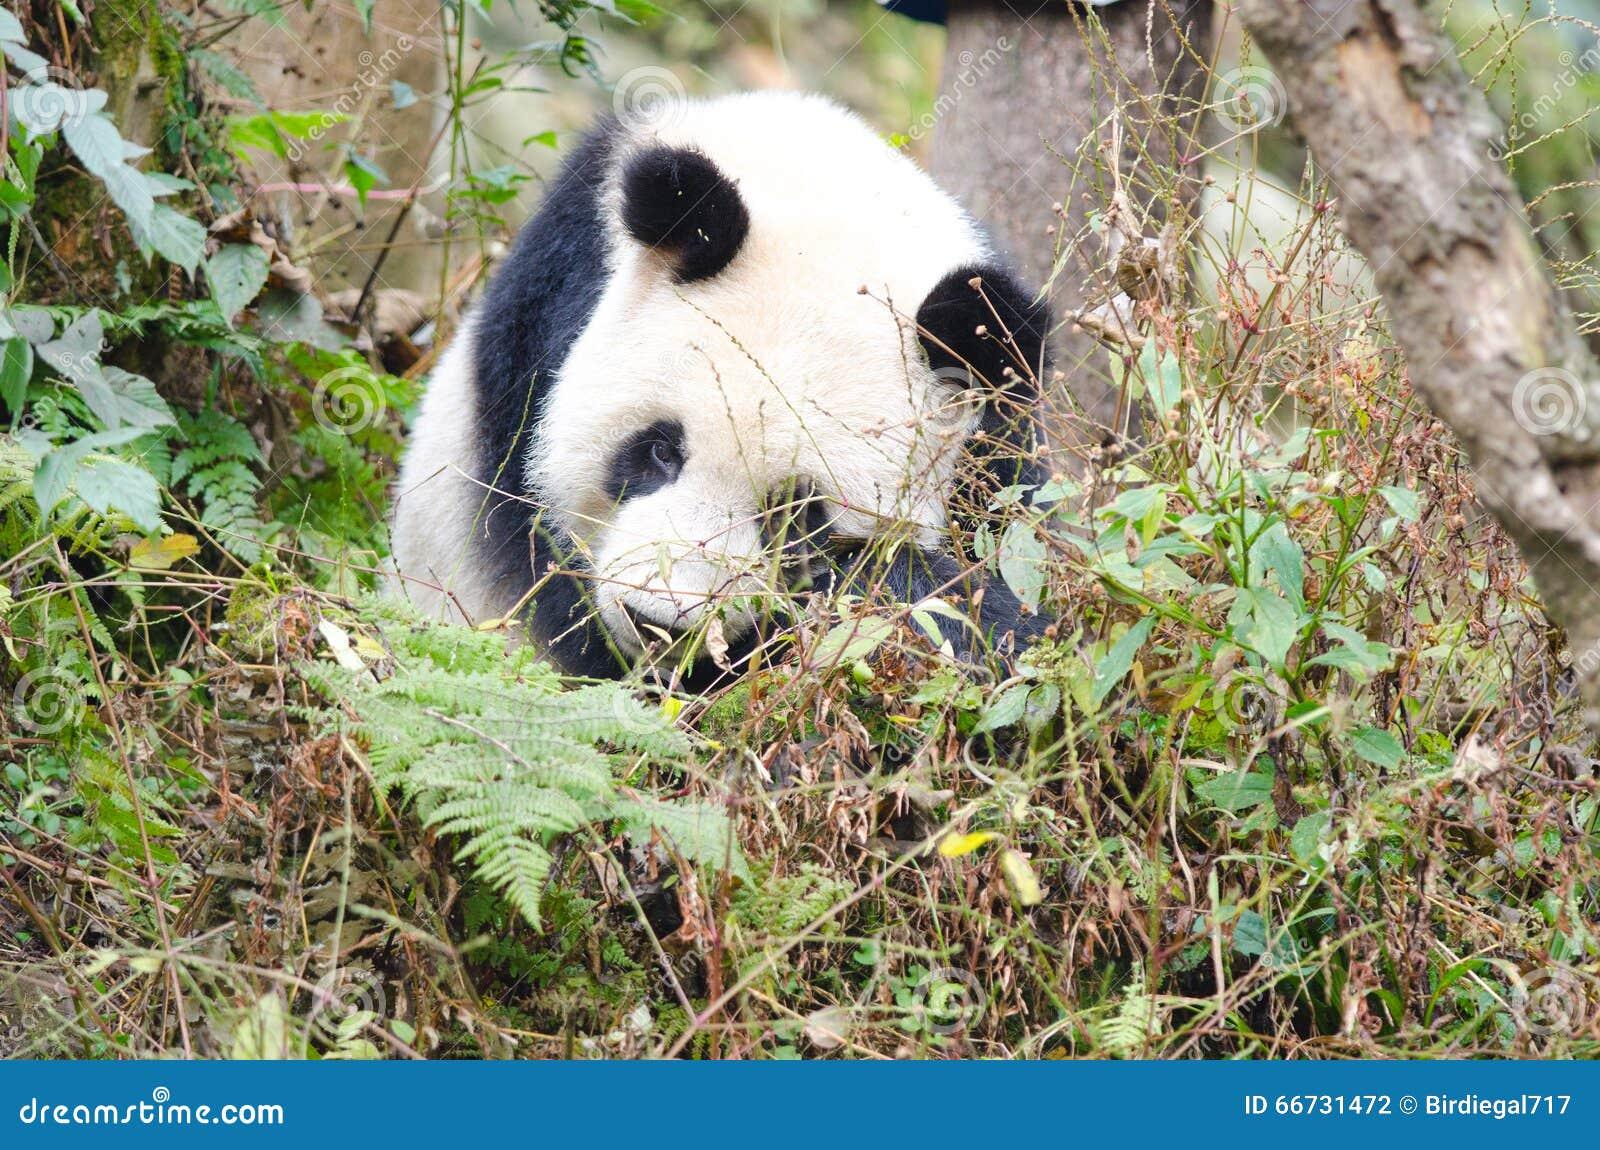 wwf panda forest - photo #17